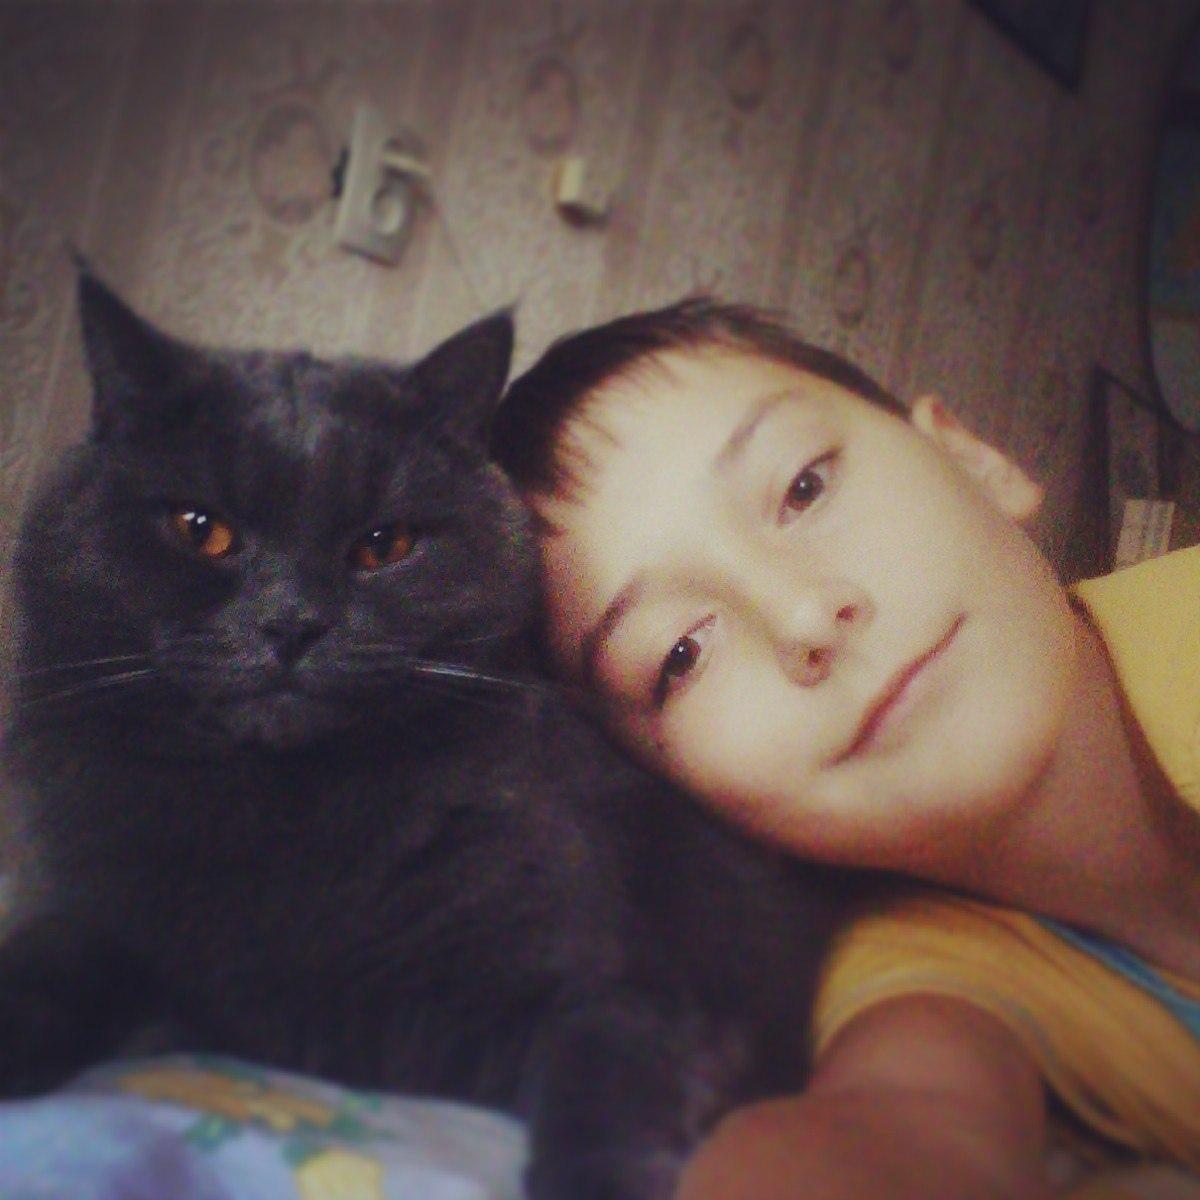 Макс Лукин, Сыктывкар - фото №14